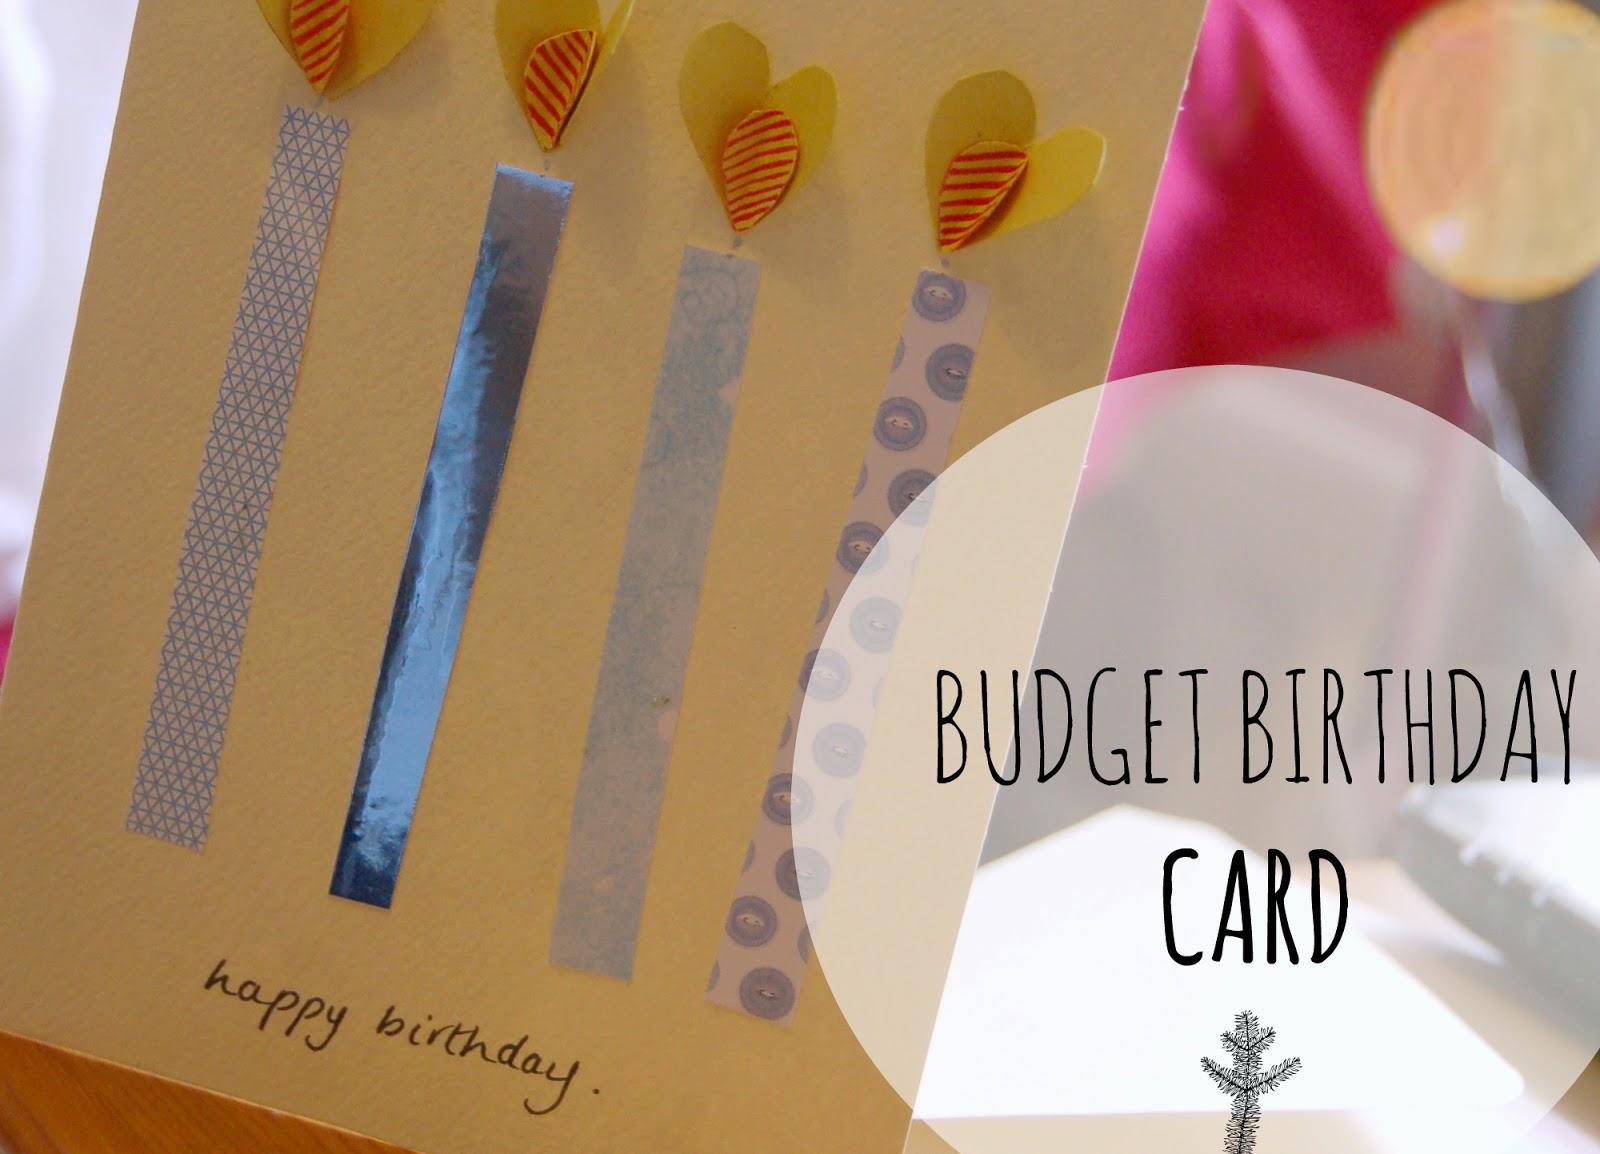 http://charnicola.blogspot.co.uk/2014/08/handmade-budget-birthday-card.html